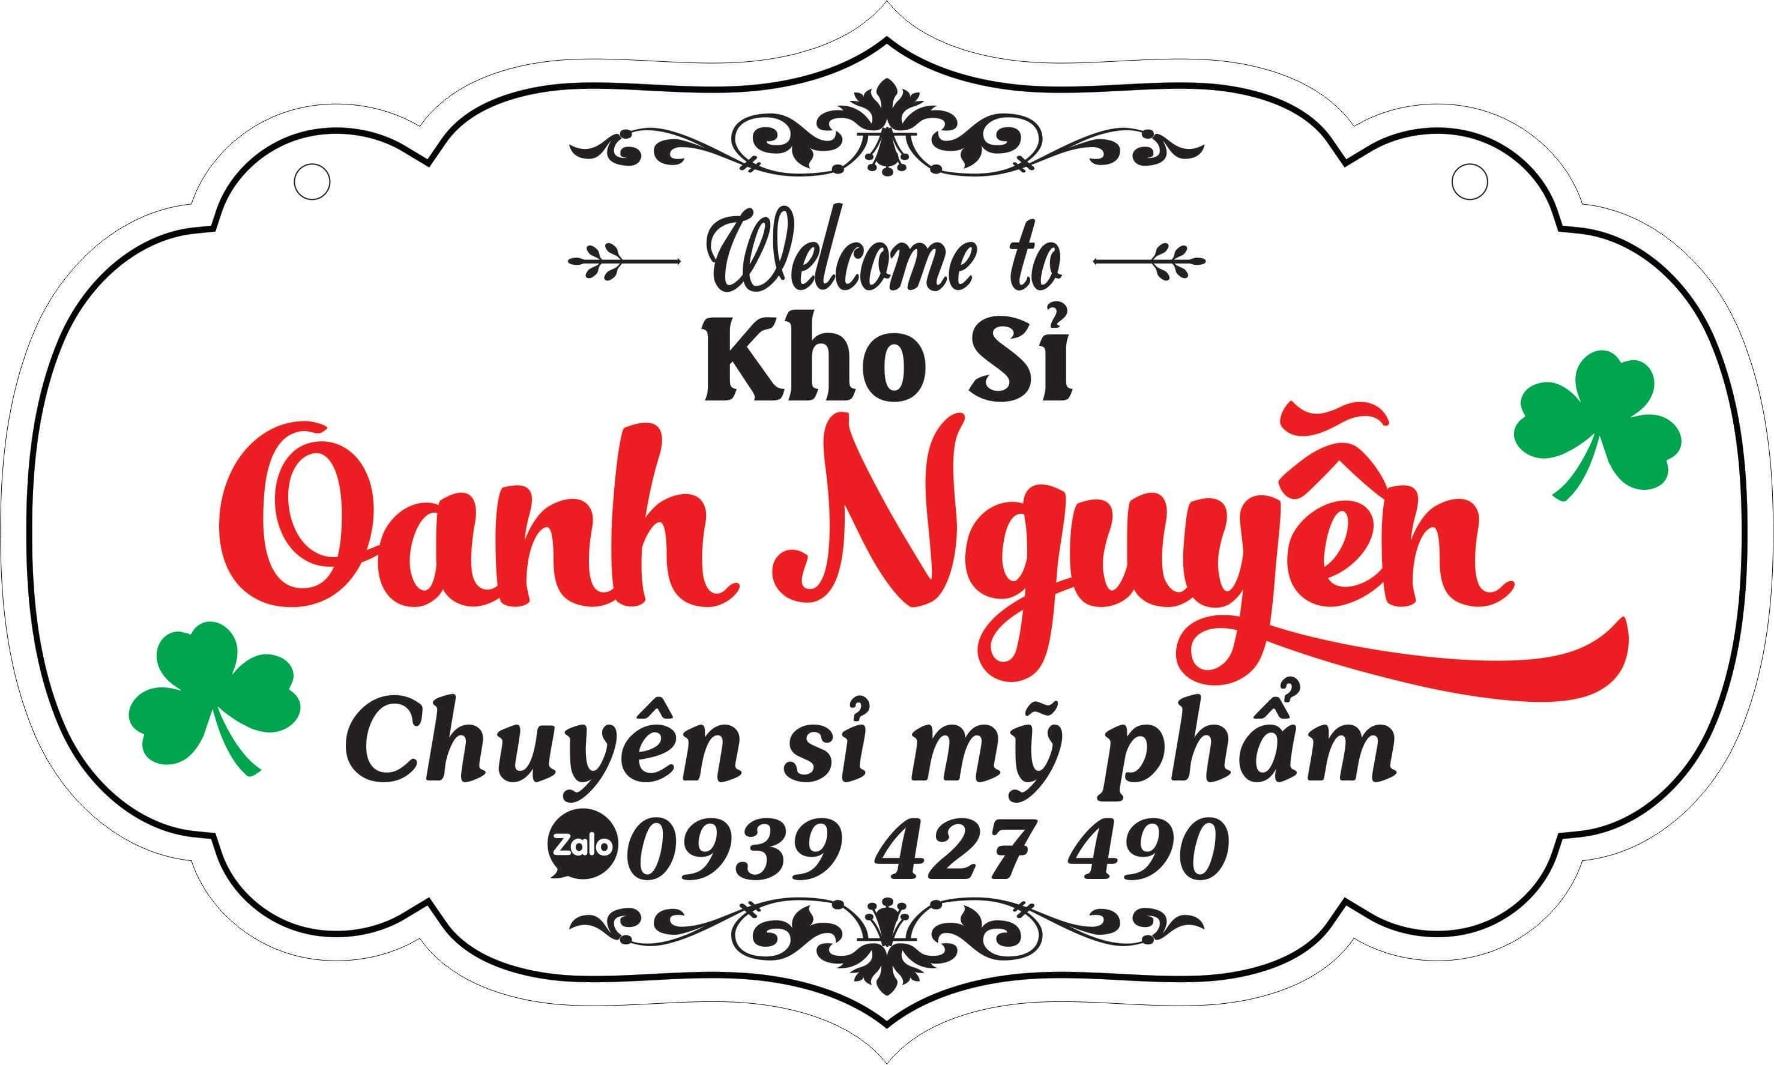 Mỹ Phẩm Oanh Nguyễn